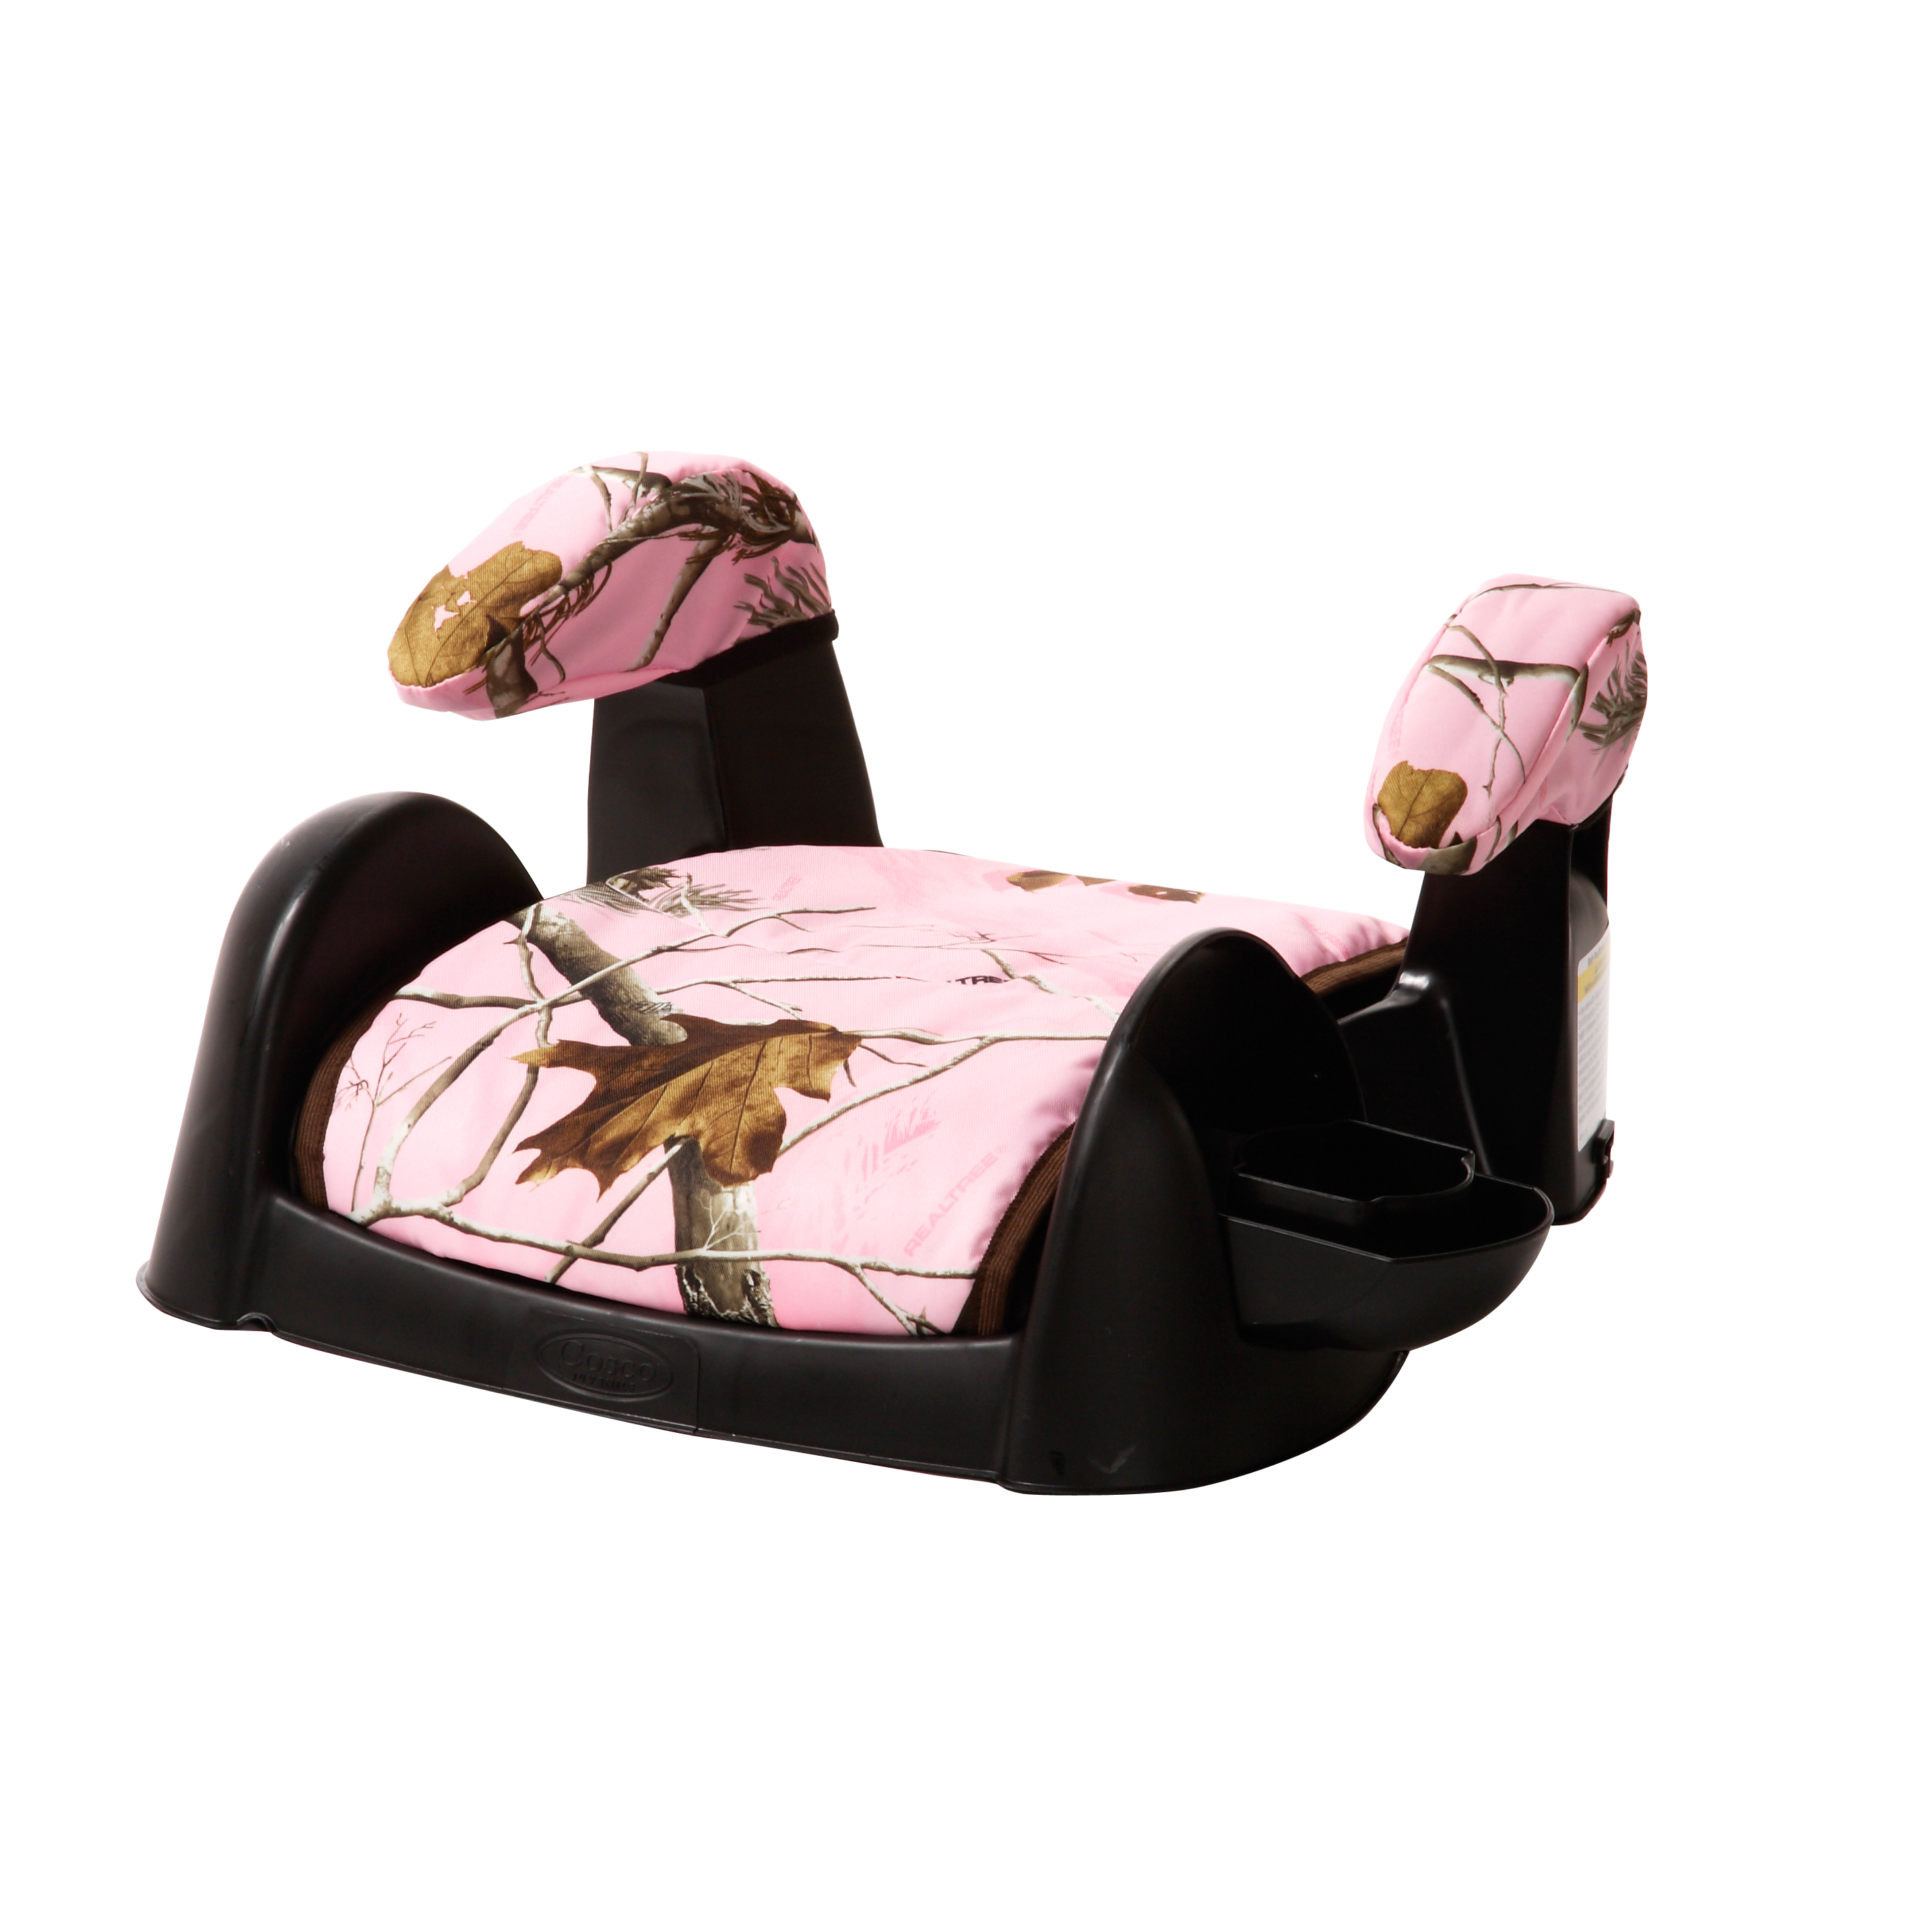 Cosco Ambassador Backless Booster Car Seat Realtree Pink